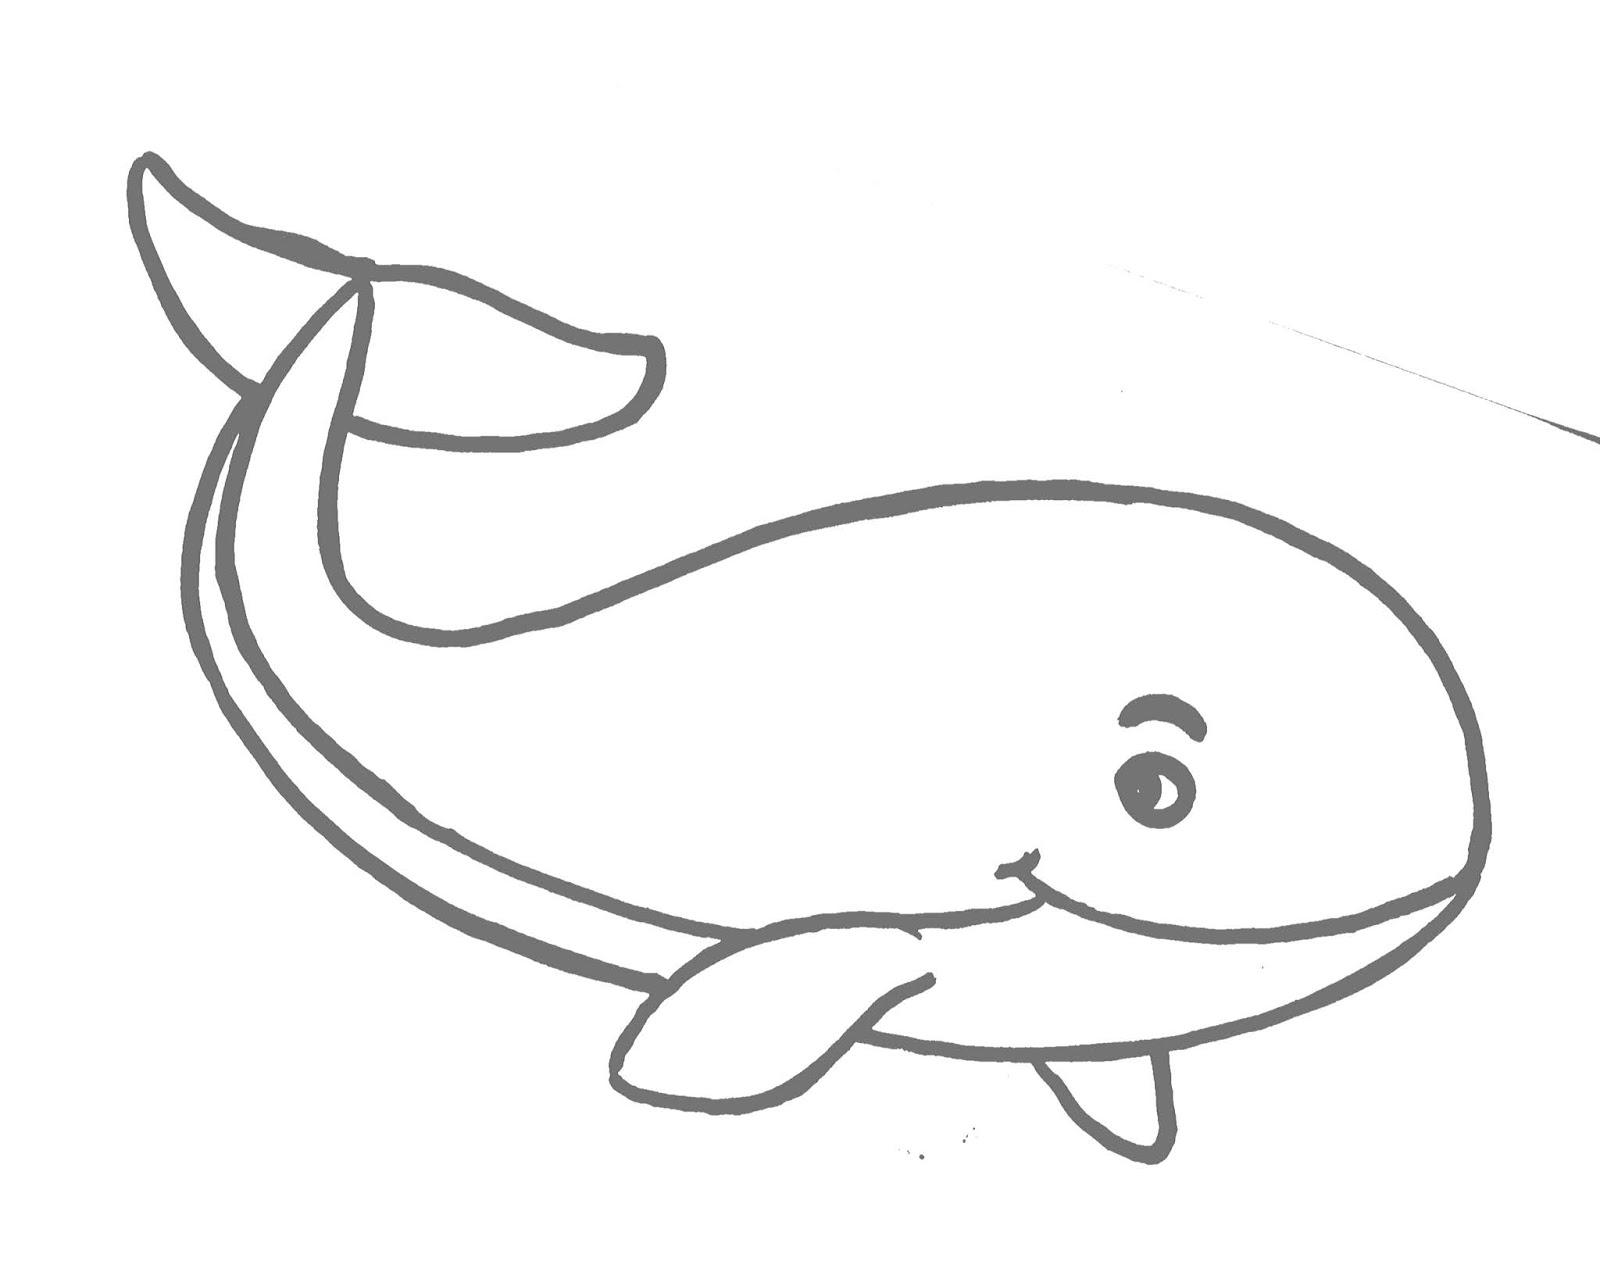 Gambar Ikan Paus Anak Sd Gambar Ikan HD